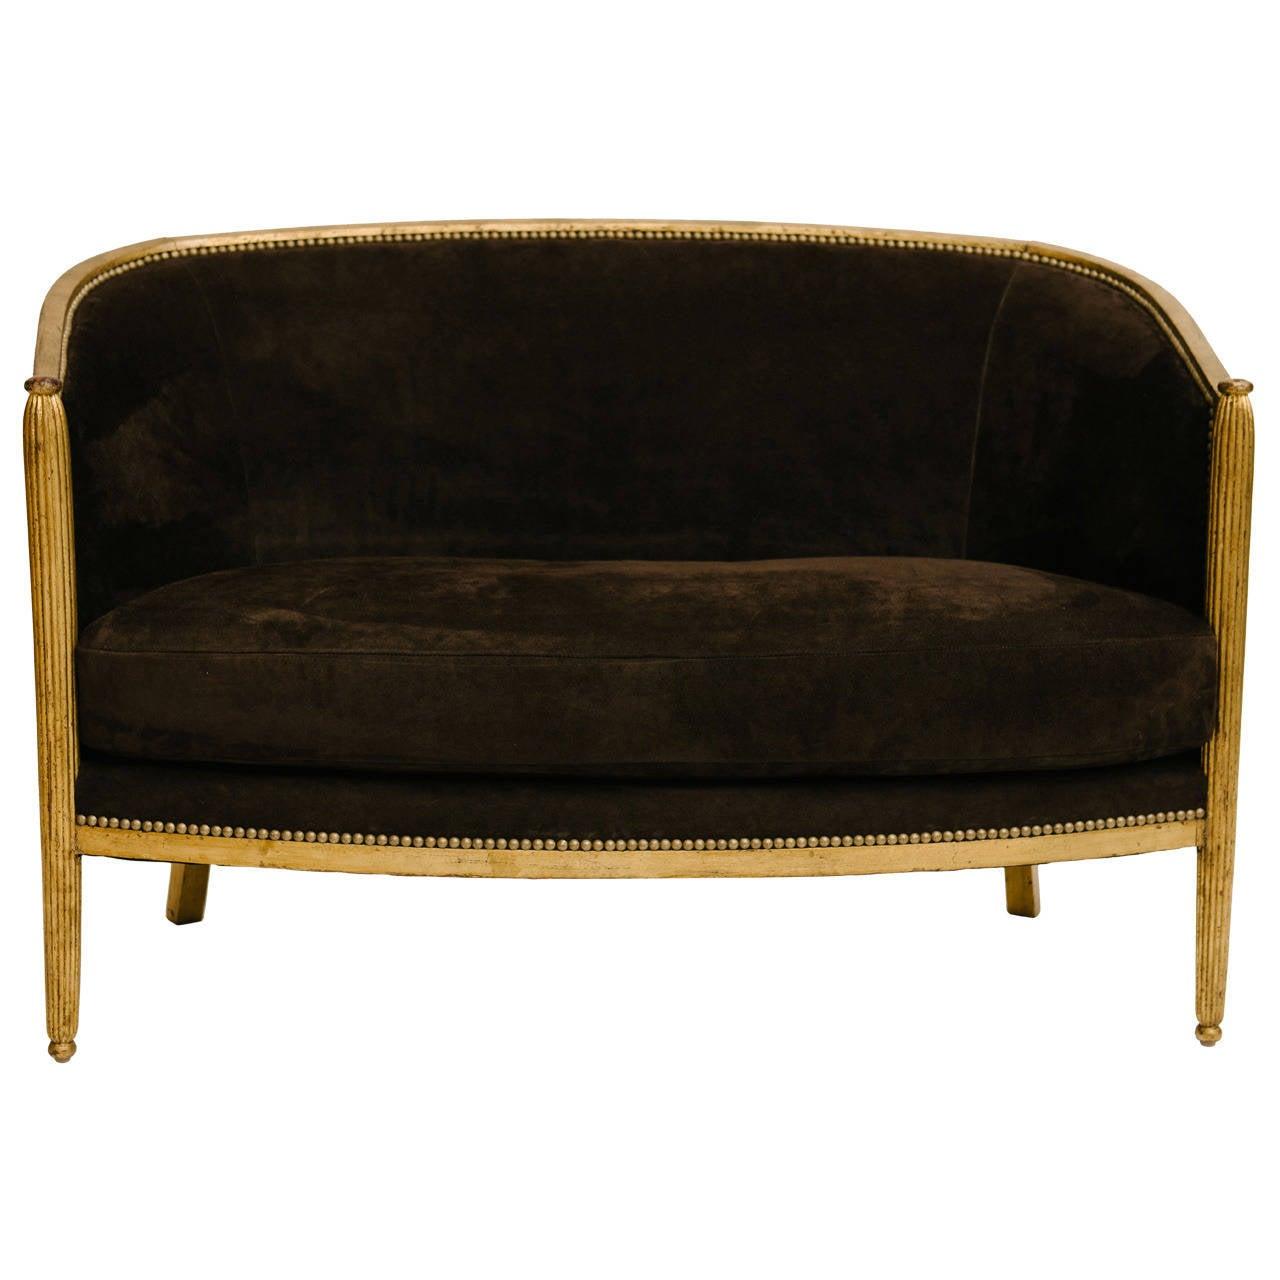 gilt art deco canap at 1stdibs. Black Bedroom Furniture Sets. Home Design Ideas